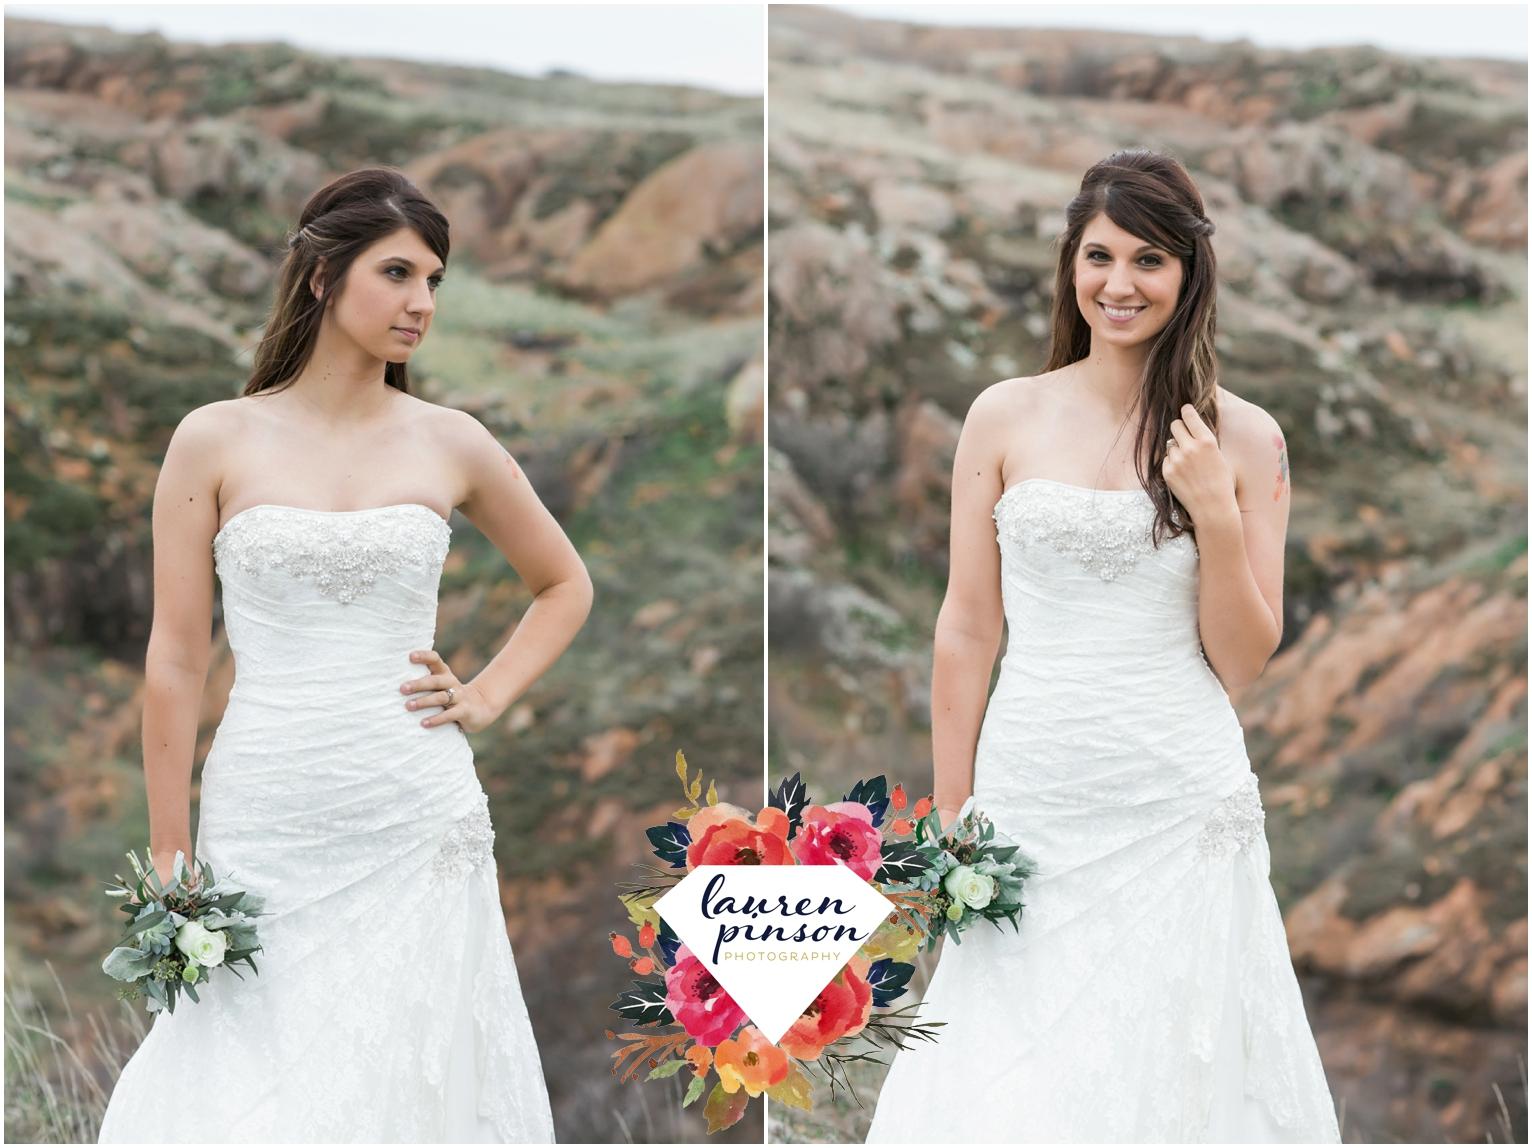 wichita-falls-wedding-photographer-oklahoma-wichita-mountains-bridal-session-bridals-photography_0684.jpg